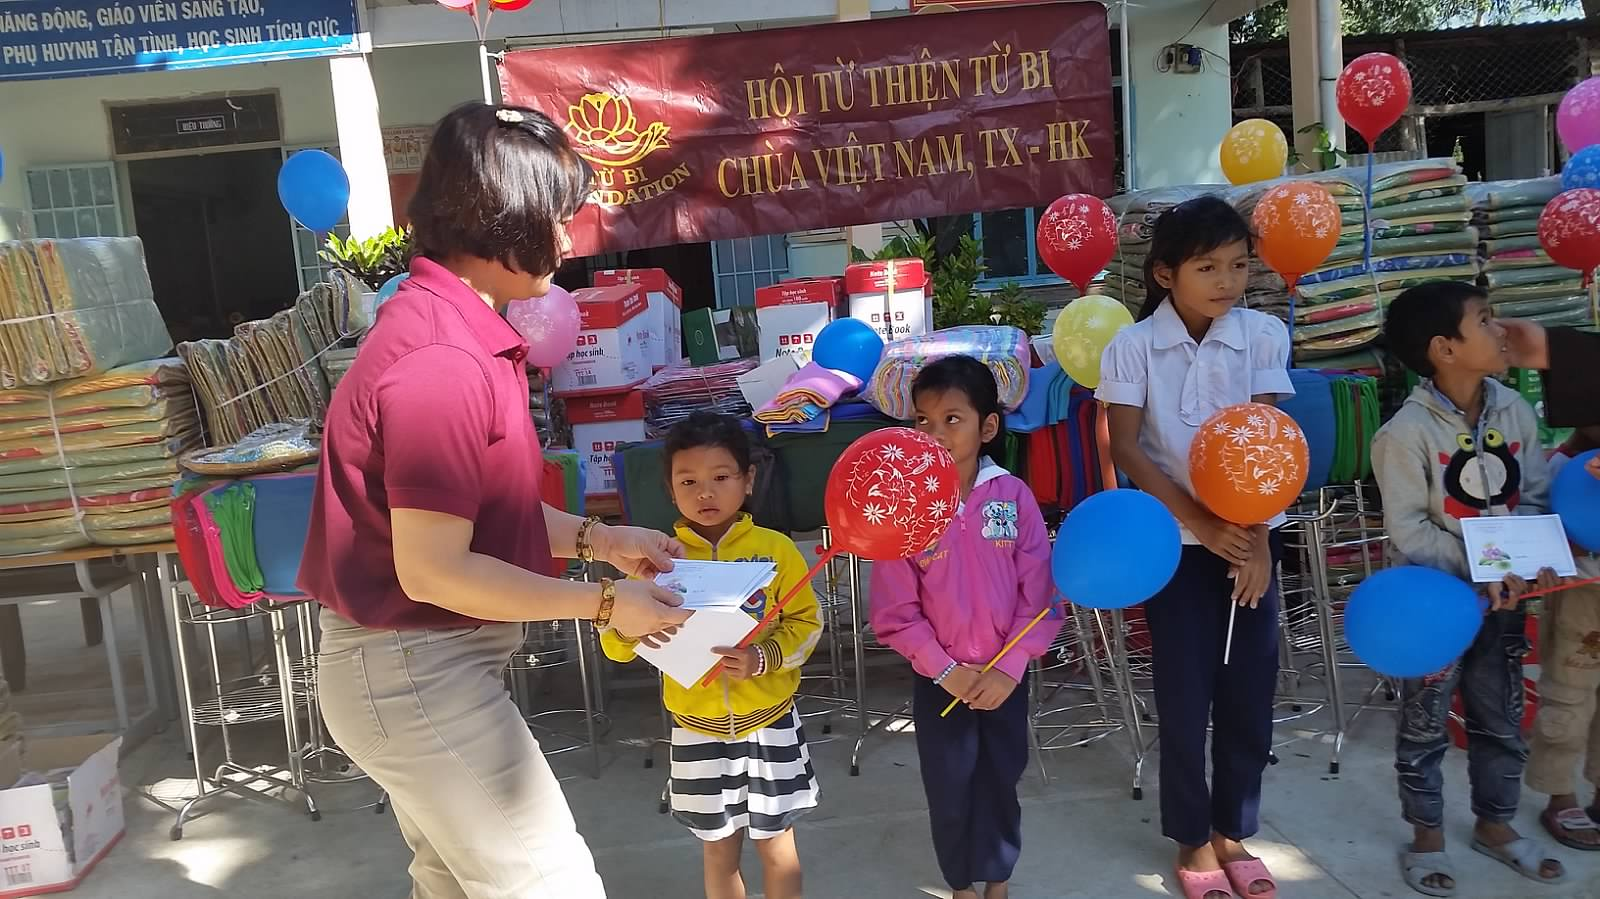 TQ Tieu Hoc Khanh Thuong 52